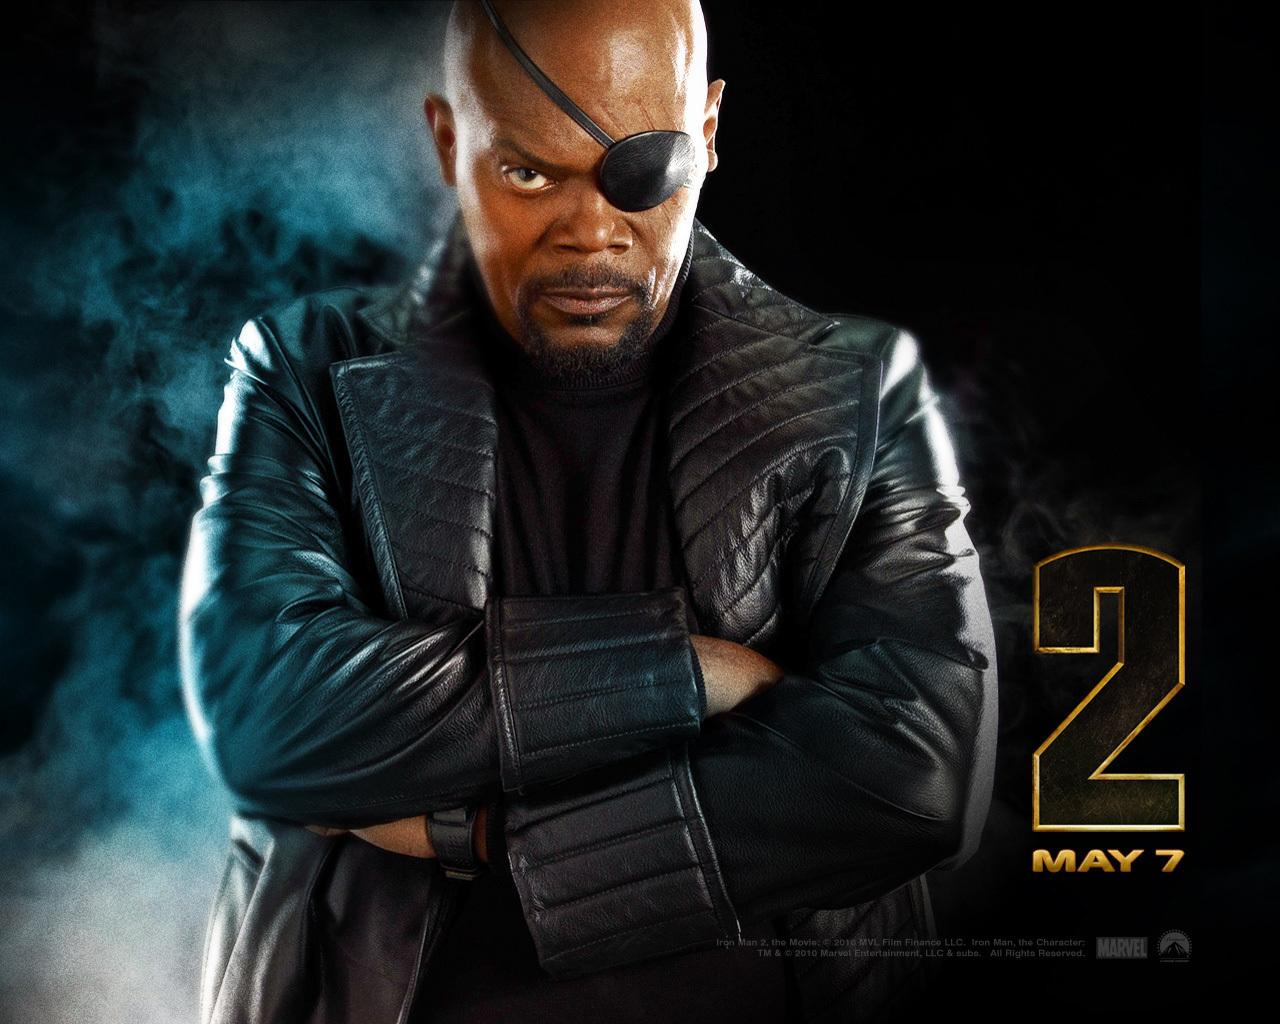 upcoming movies images iron man 2 2010 hd wallpaper and